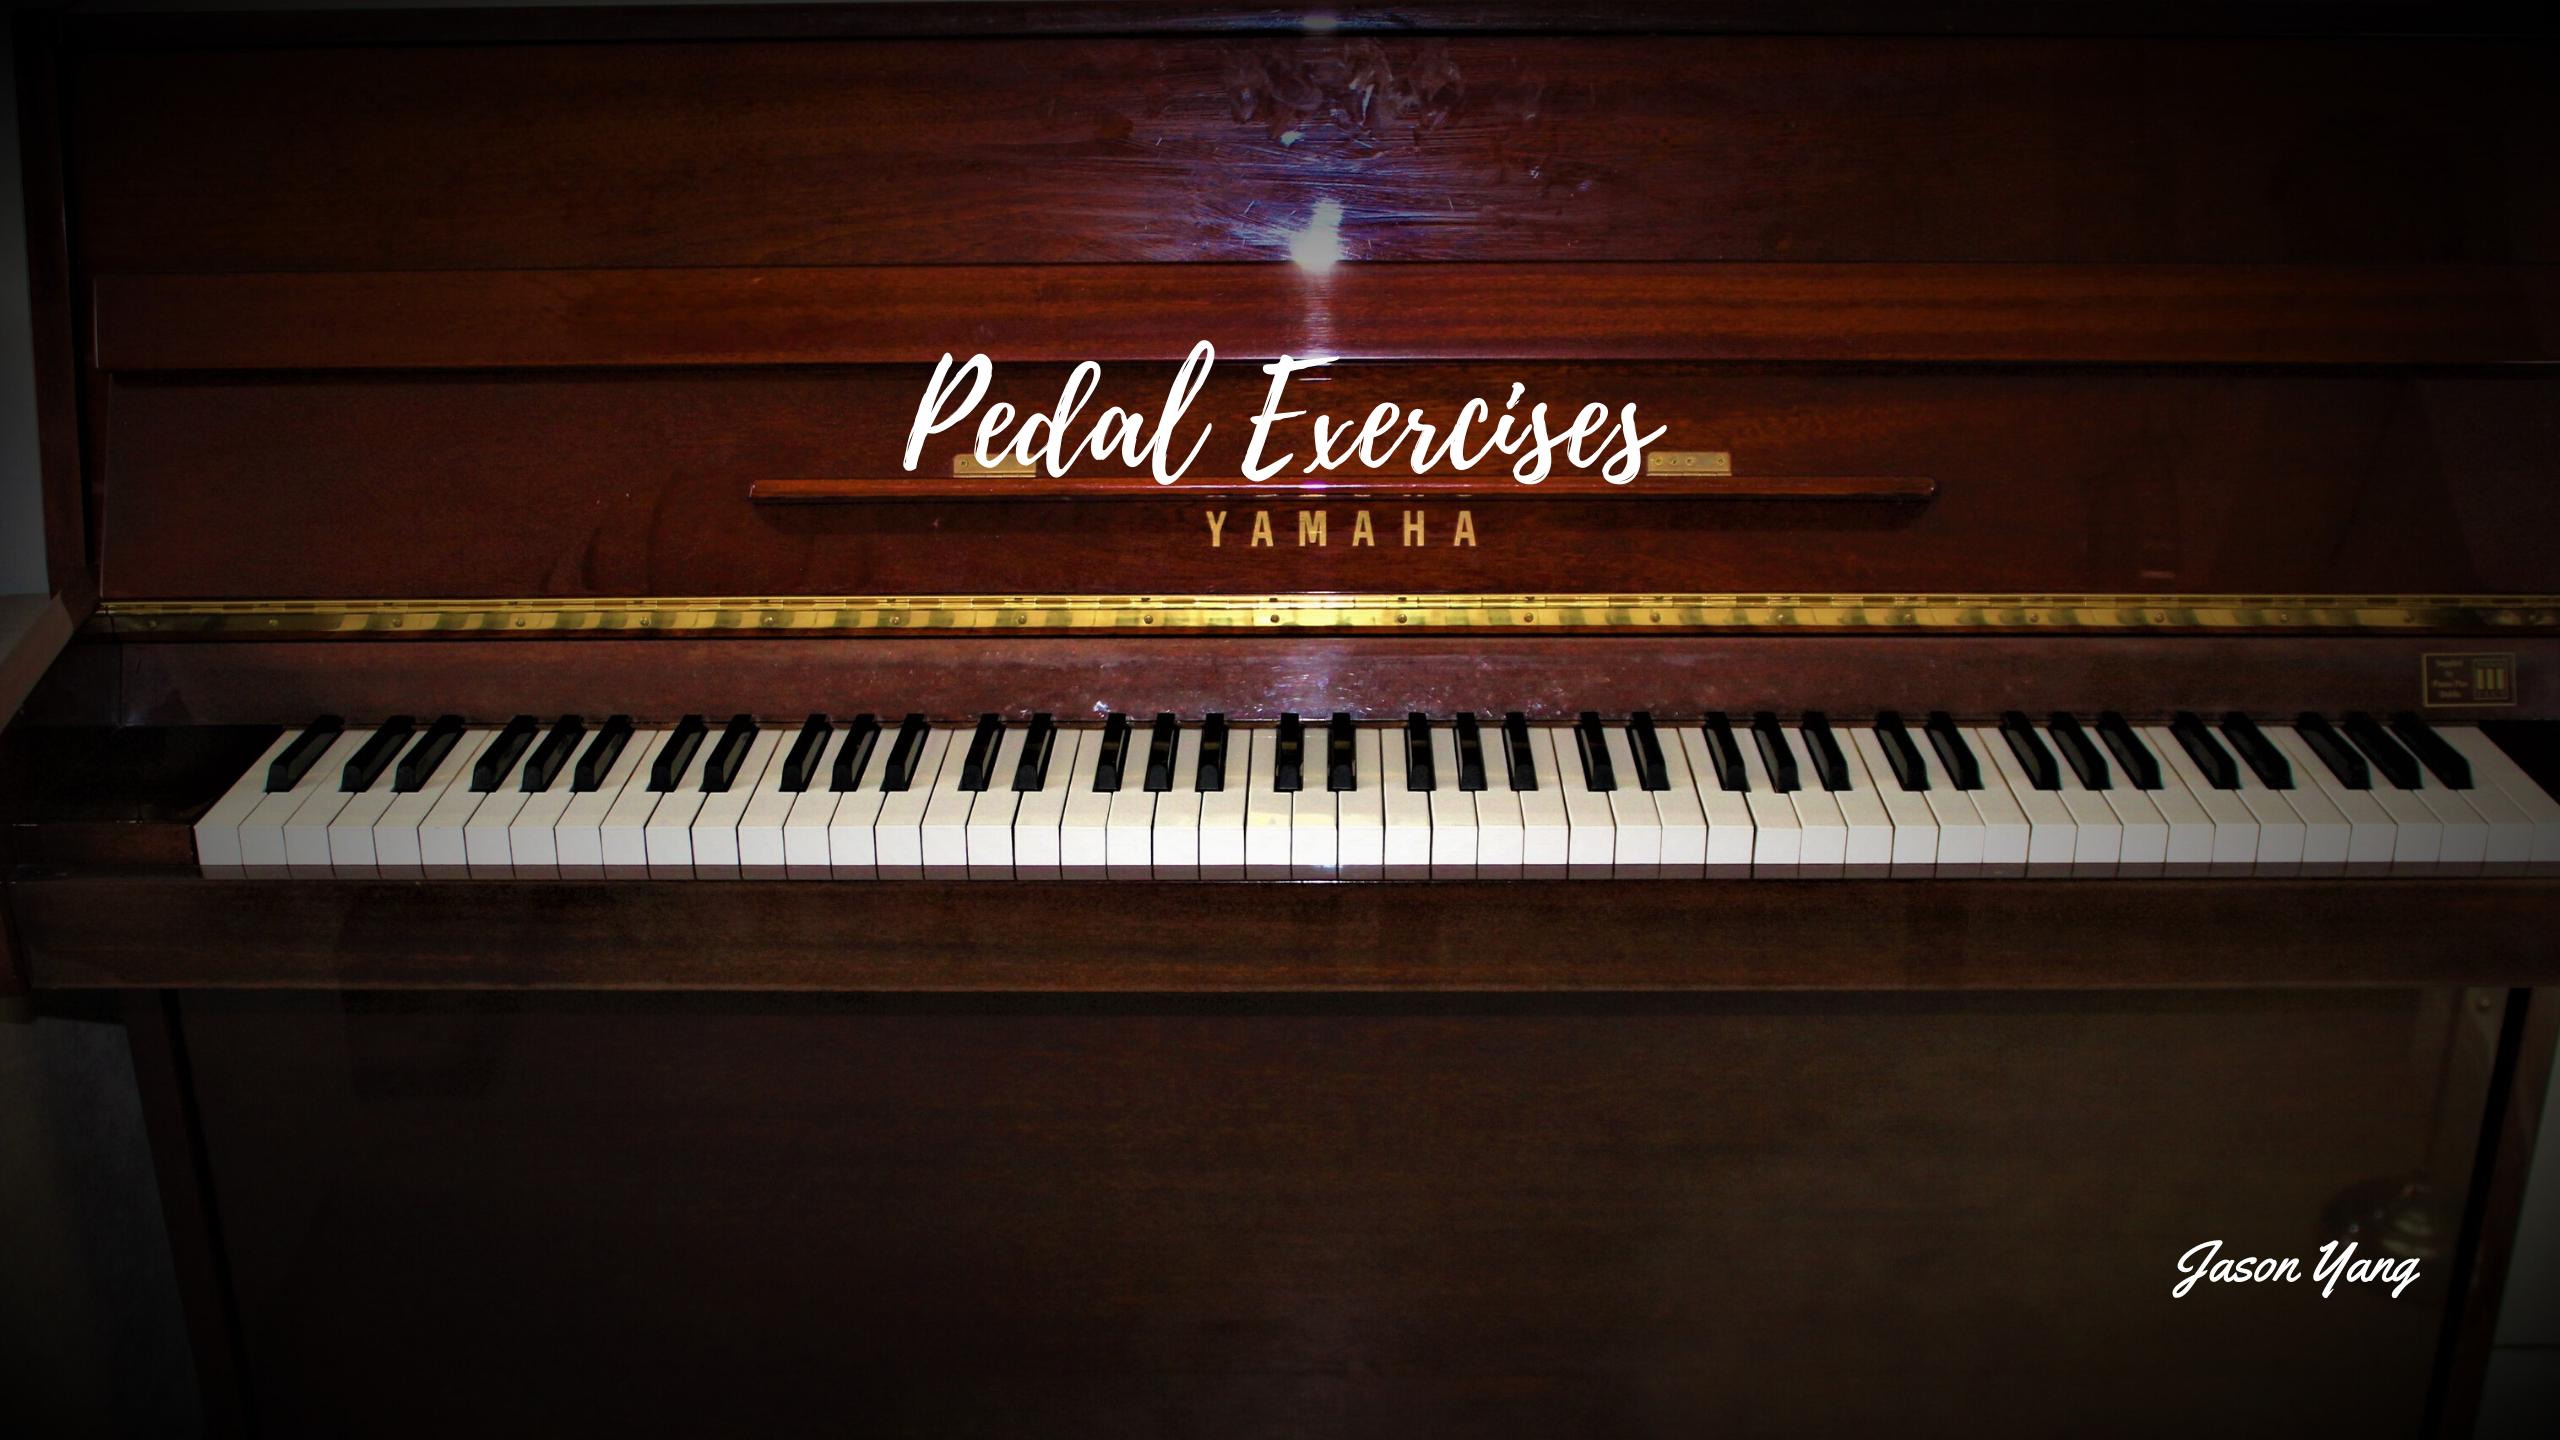 Pedal Exercises - Jason Yang Pianist